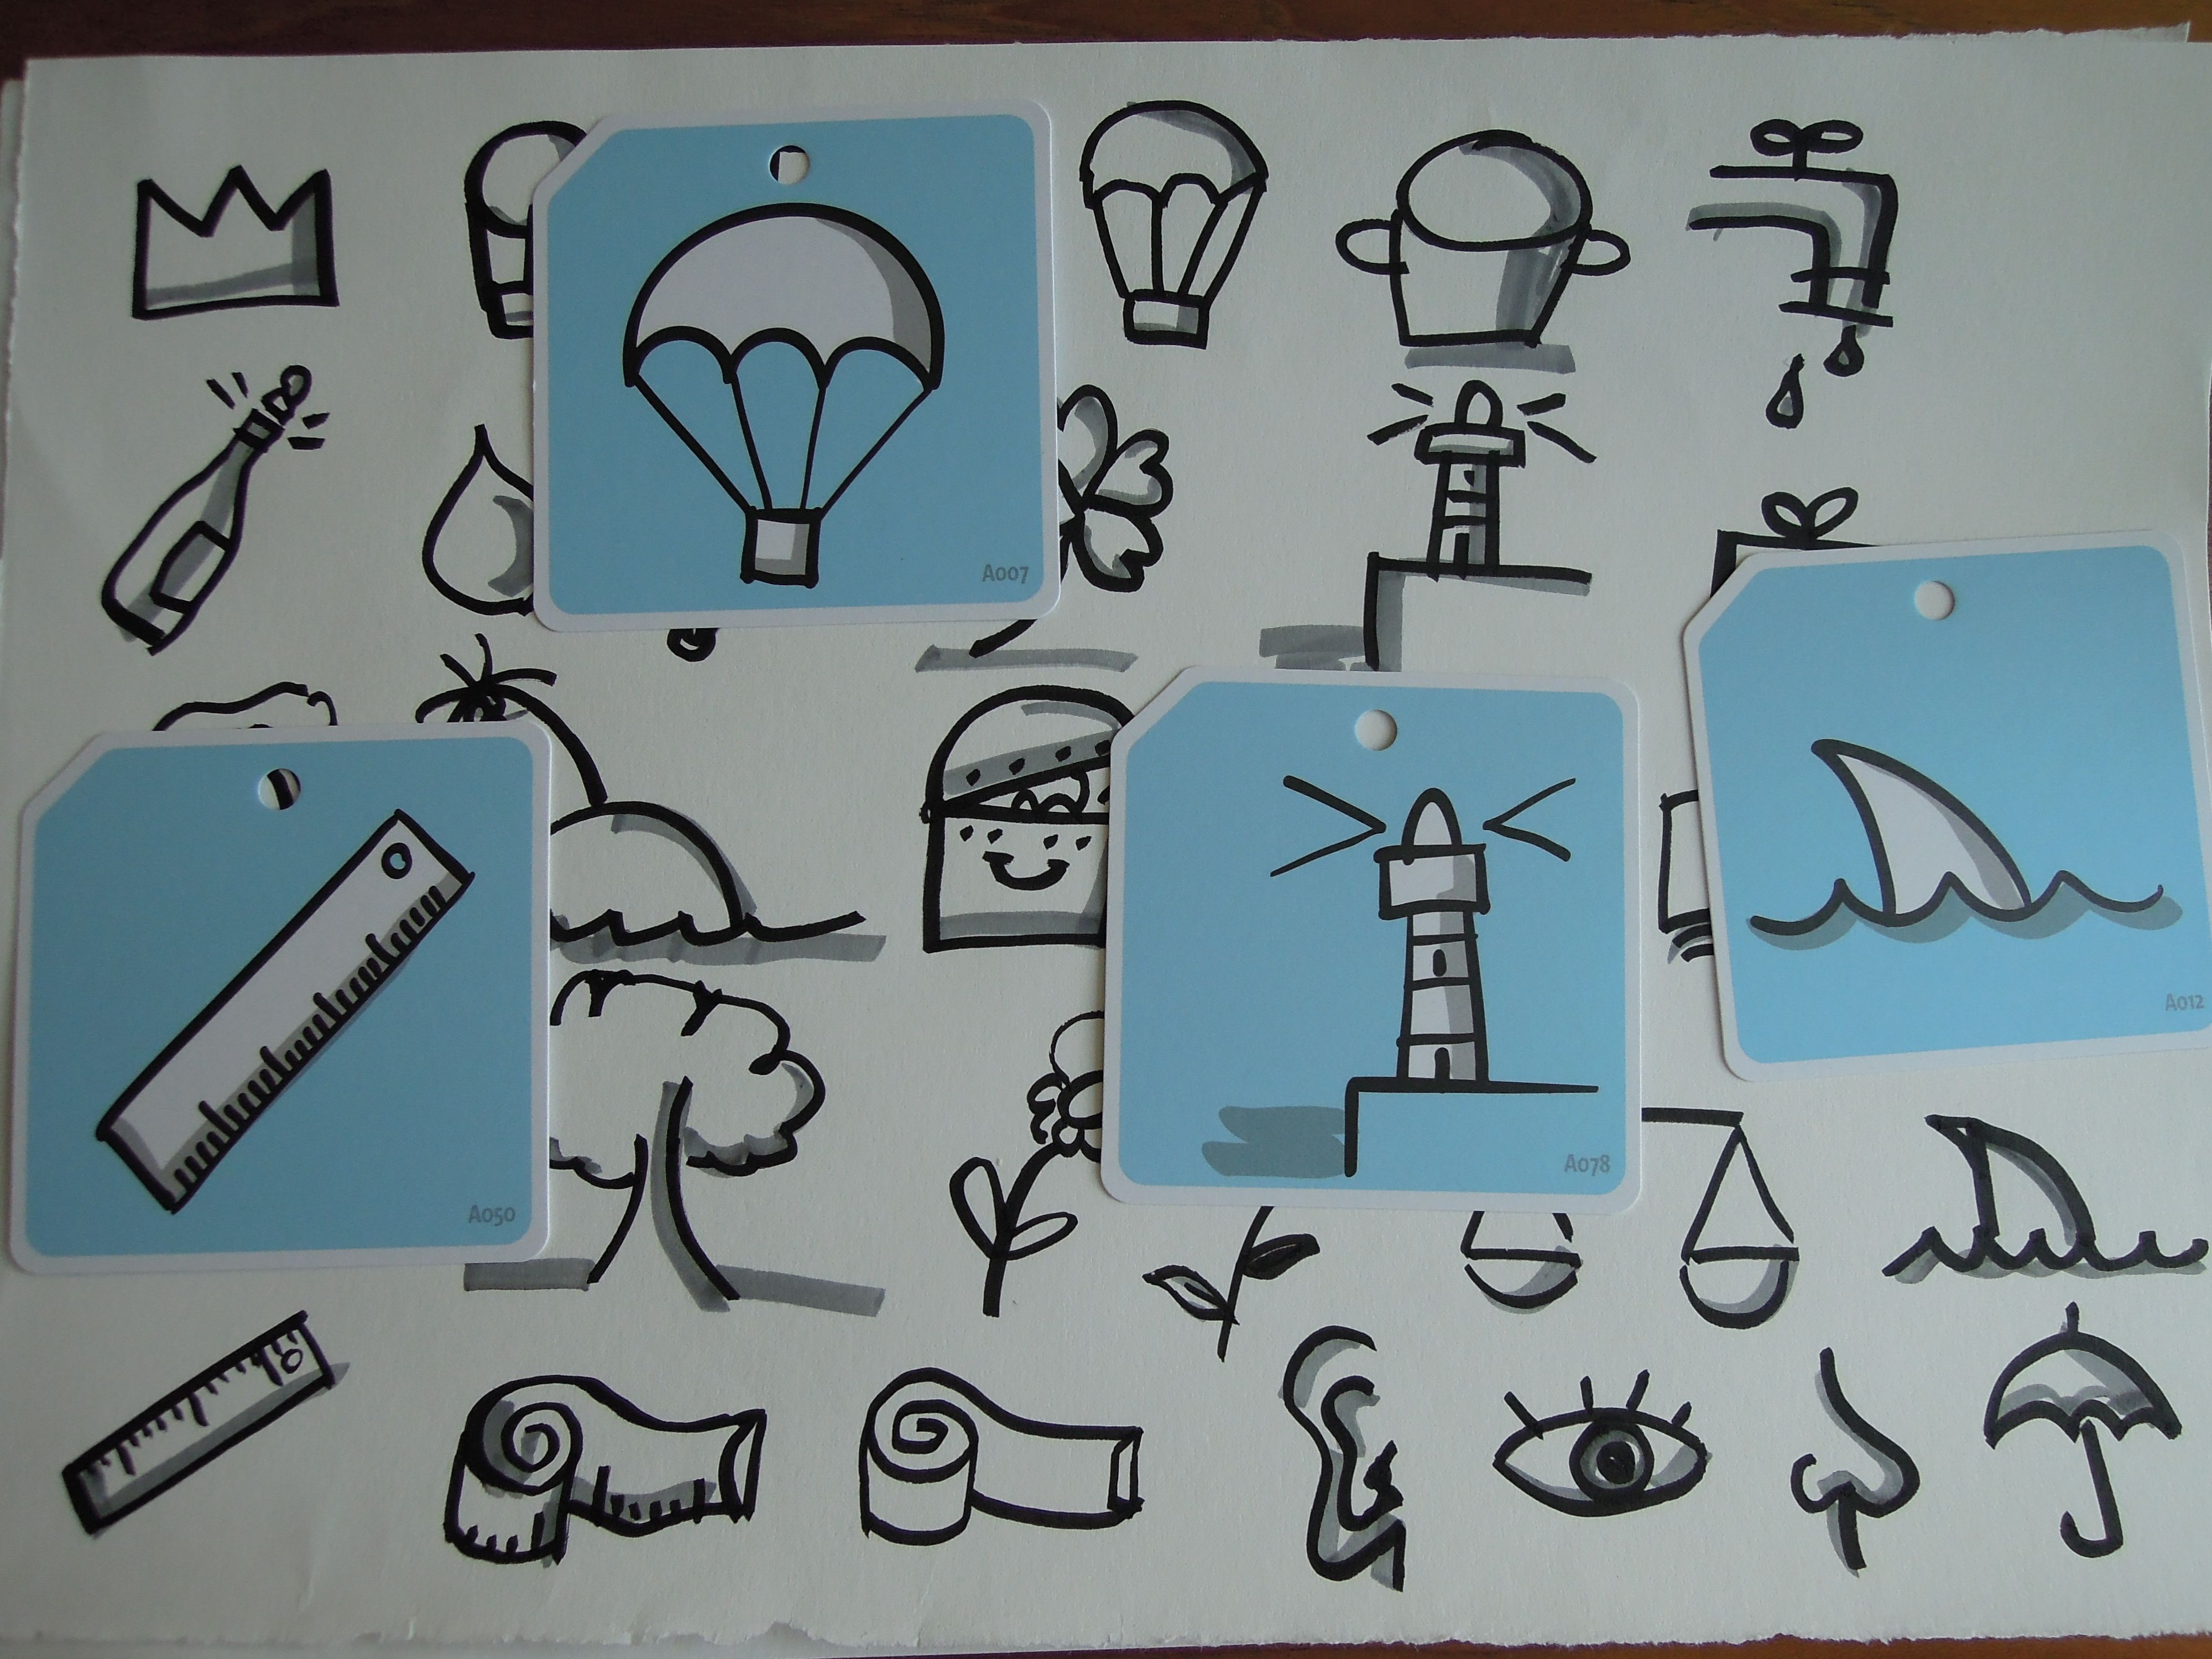 Bikablo Icons : Symbols 작성 예시 - drawing